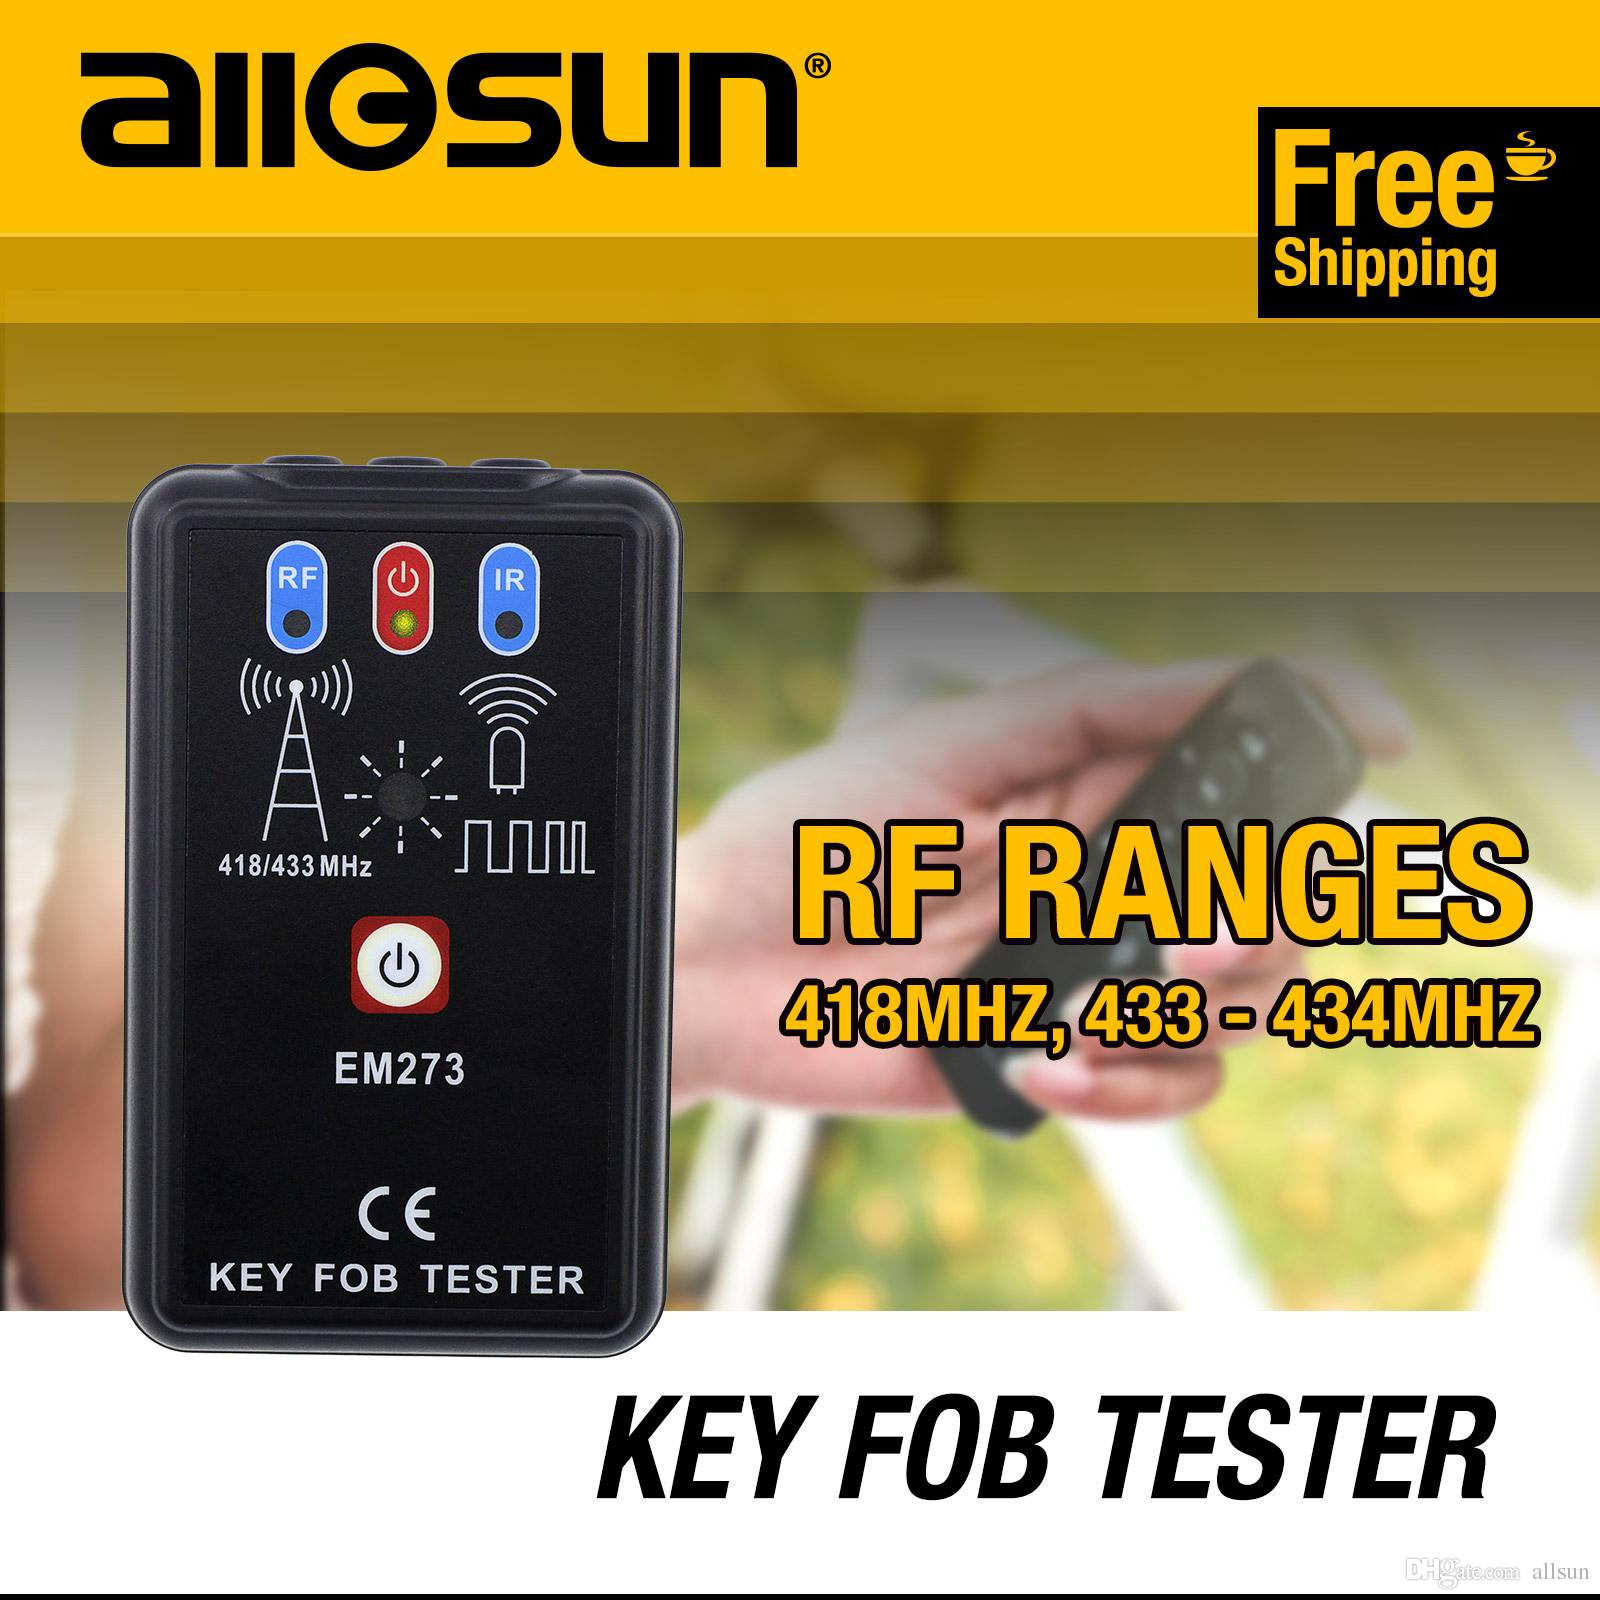 Allsun Portable Key Fob Tester Radio Frequency & Infrared Vehicular Remote  Controller Wave Analyzer Tool EM273 Signal Receiver